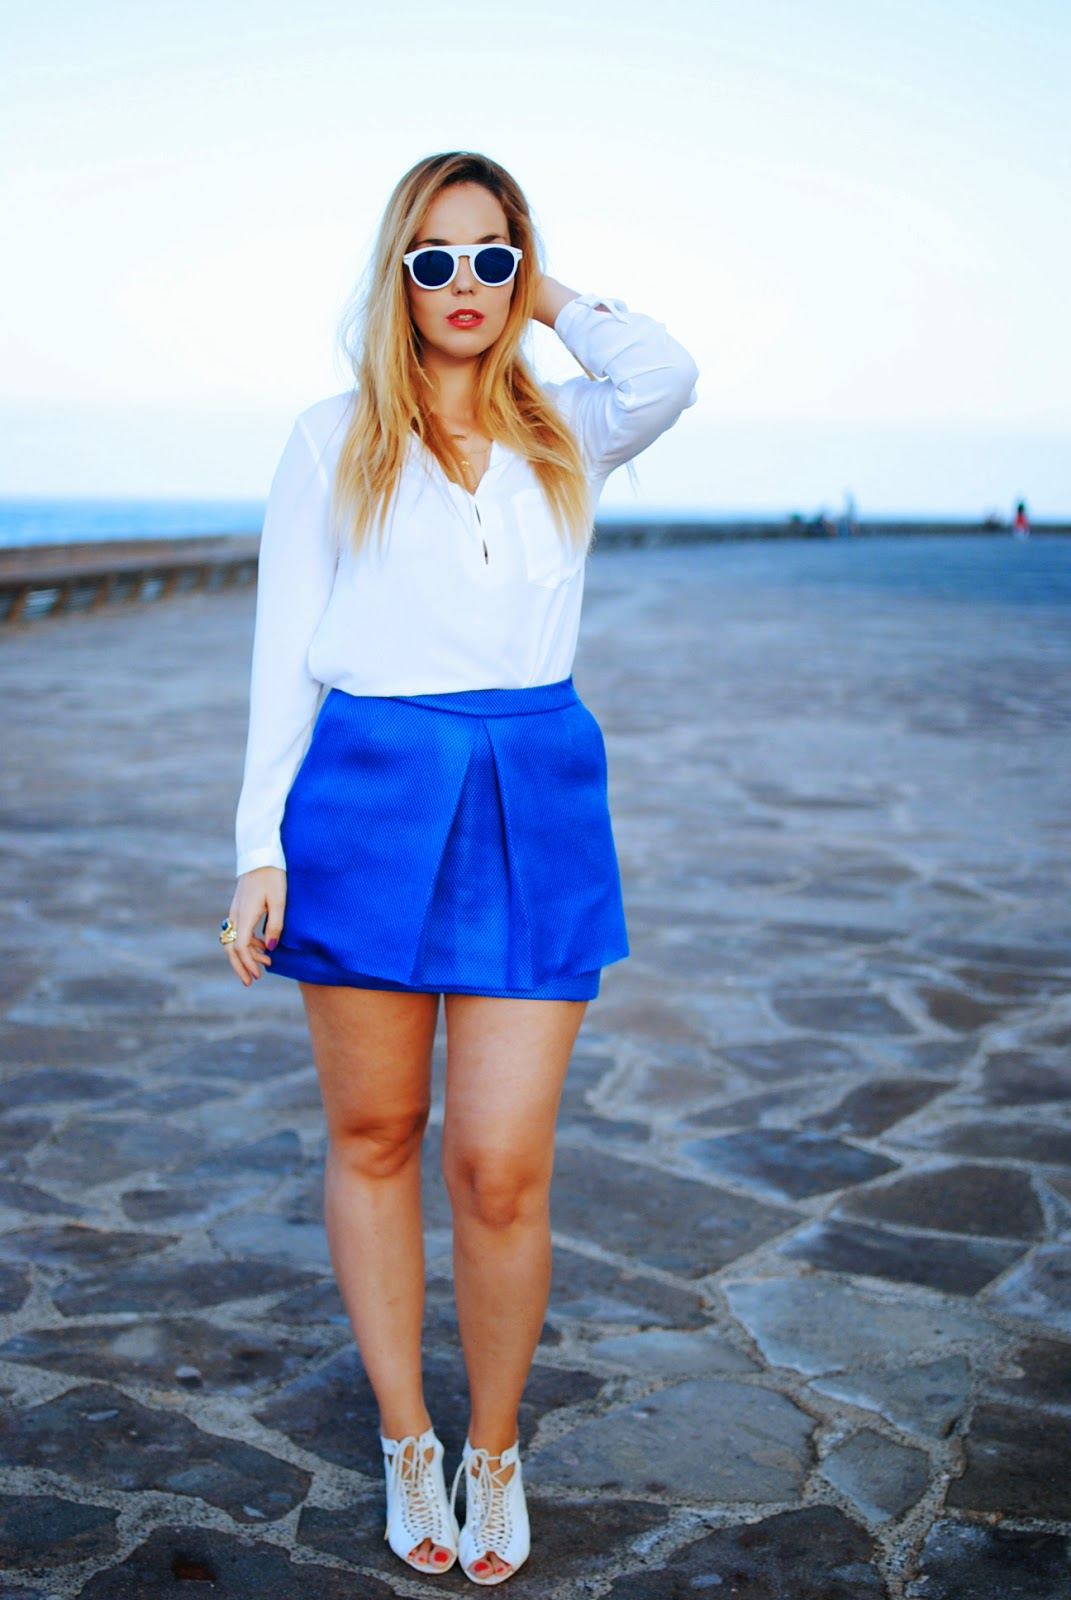 nery hdez, gafas de espejo, azul klein, blonde, wholesales celebshades, front row shop,